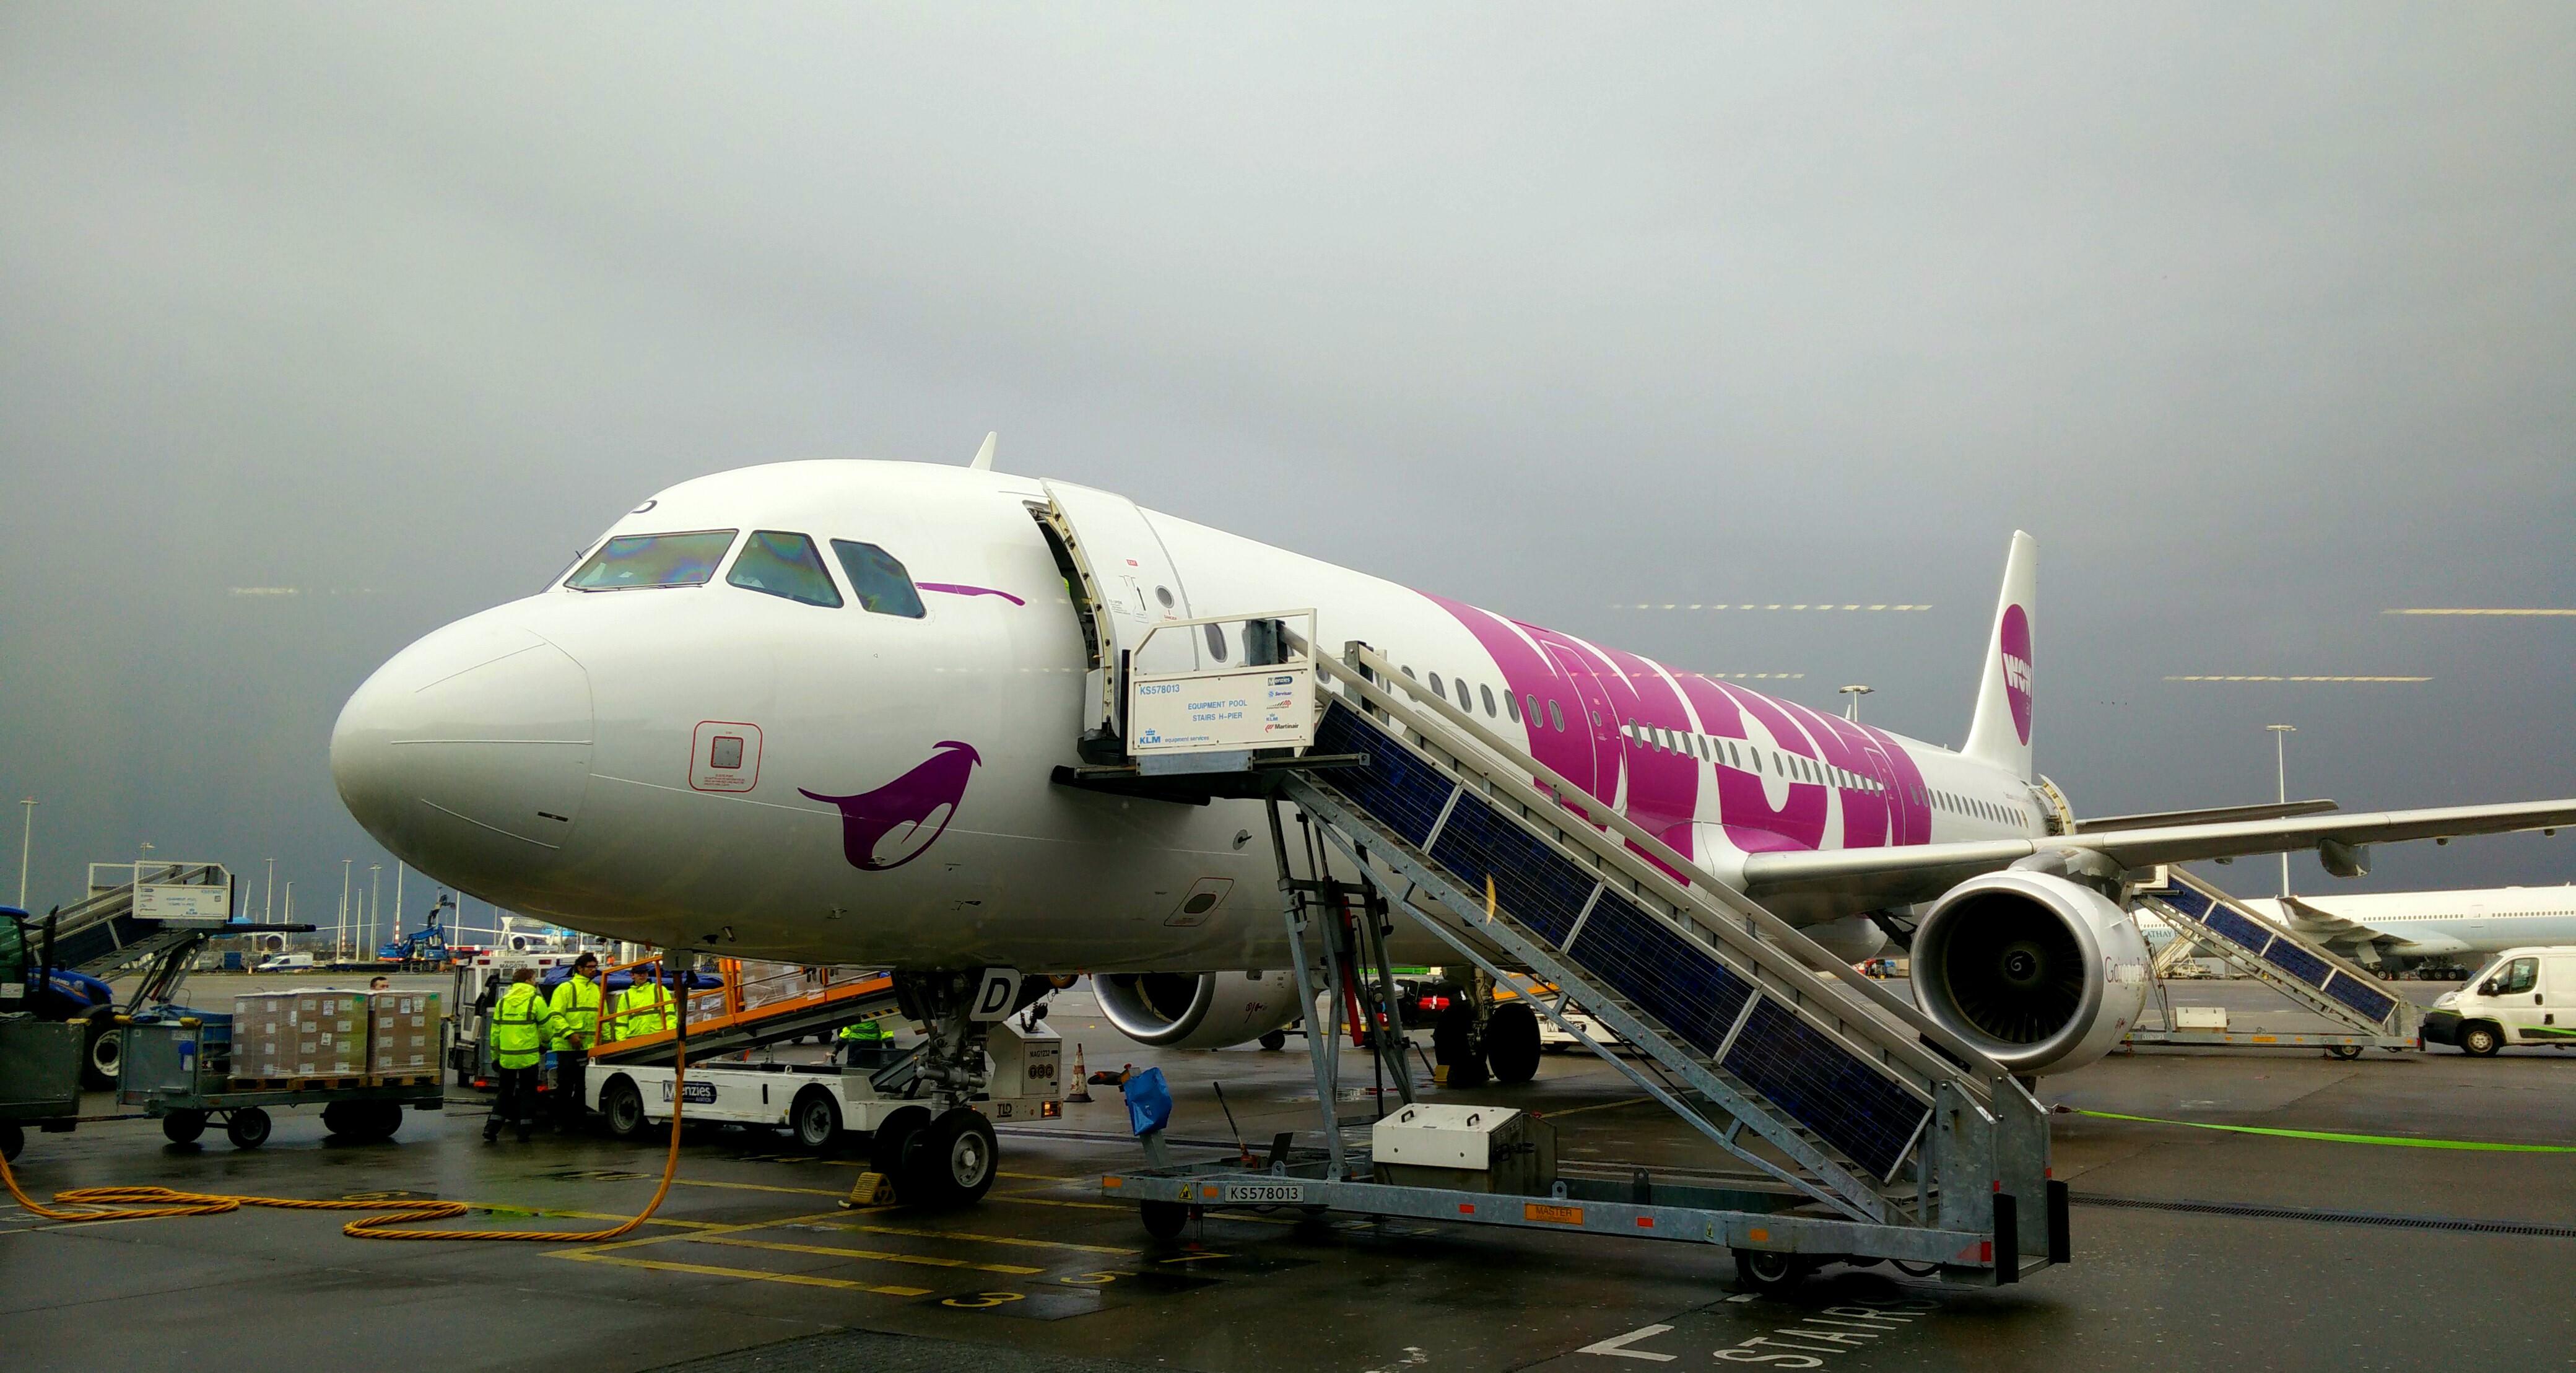 photos officielles 0d9c5 13dba Vliegen met WOW air? IJsland - Safe and Healthy Travel